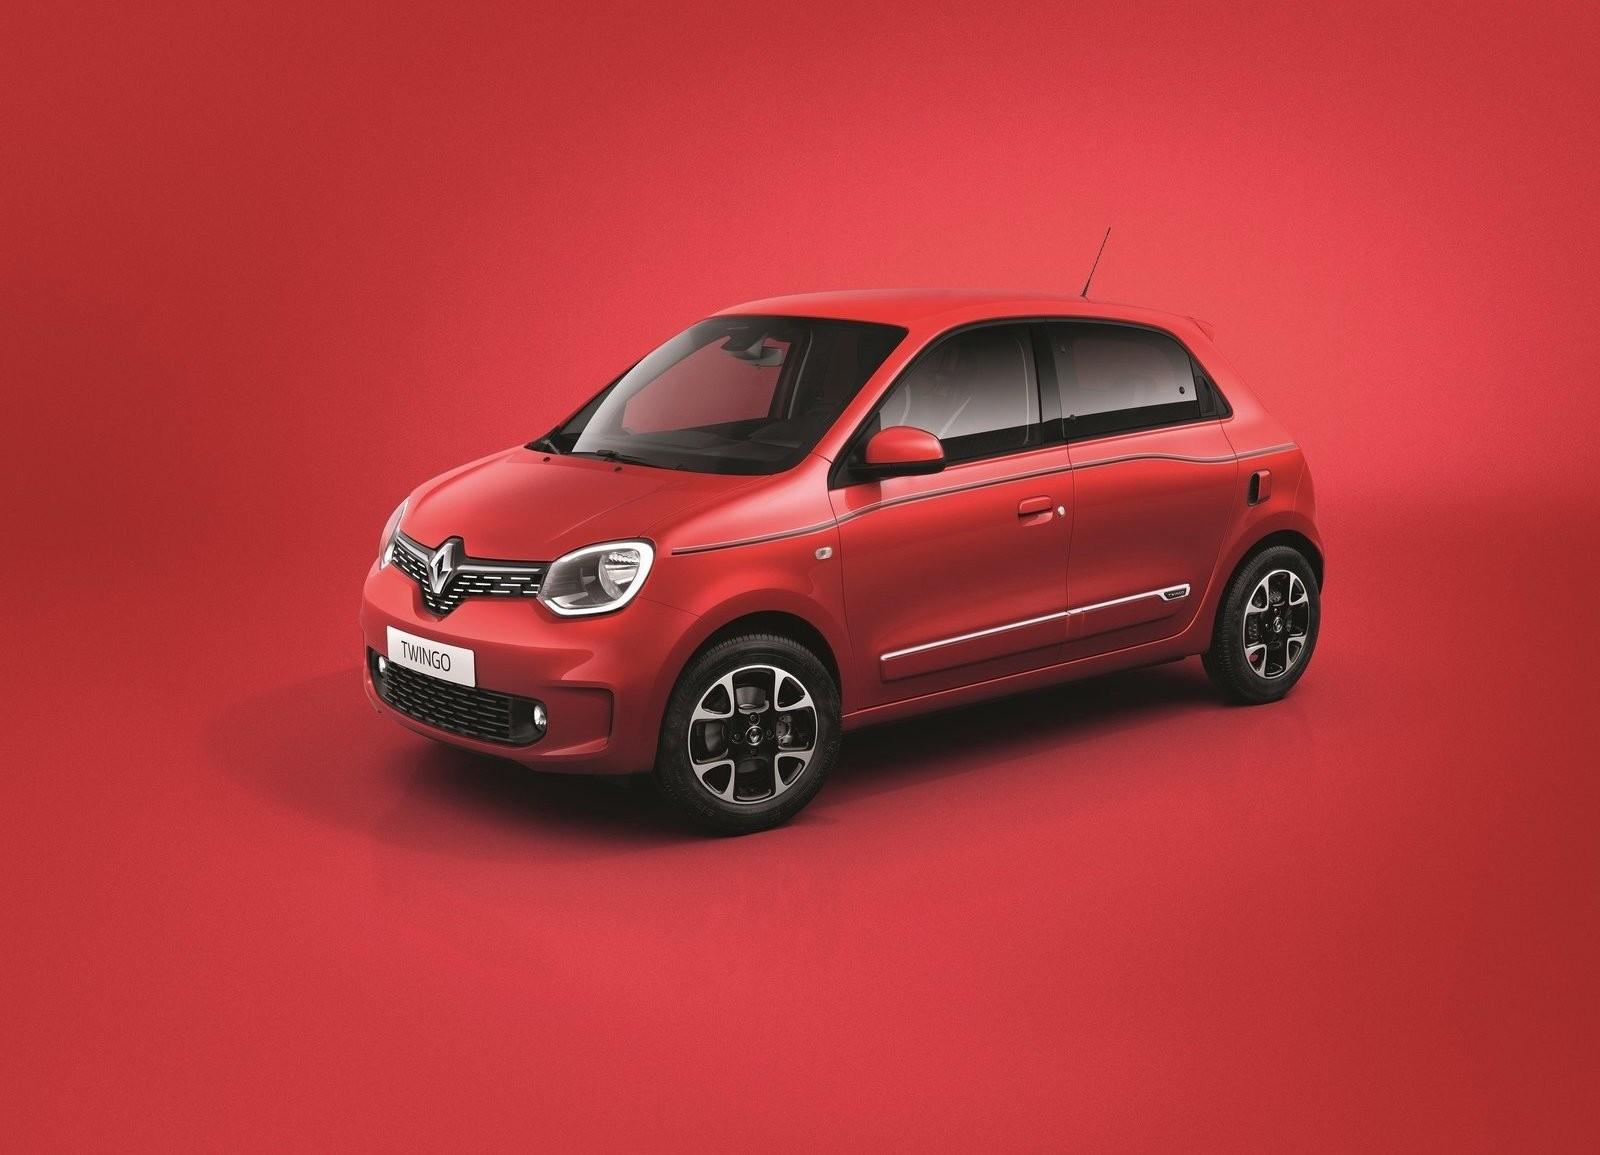 Foto de Renault Twingo 2020 (15/20)